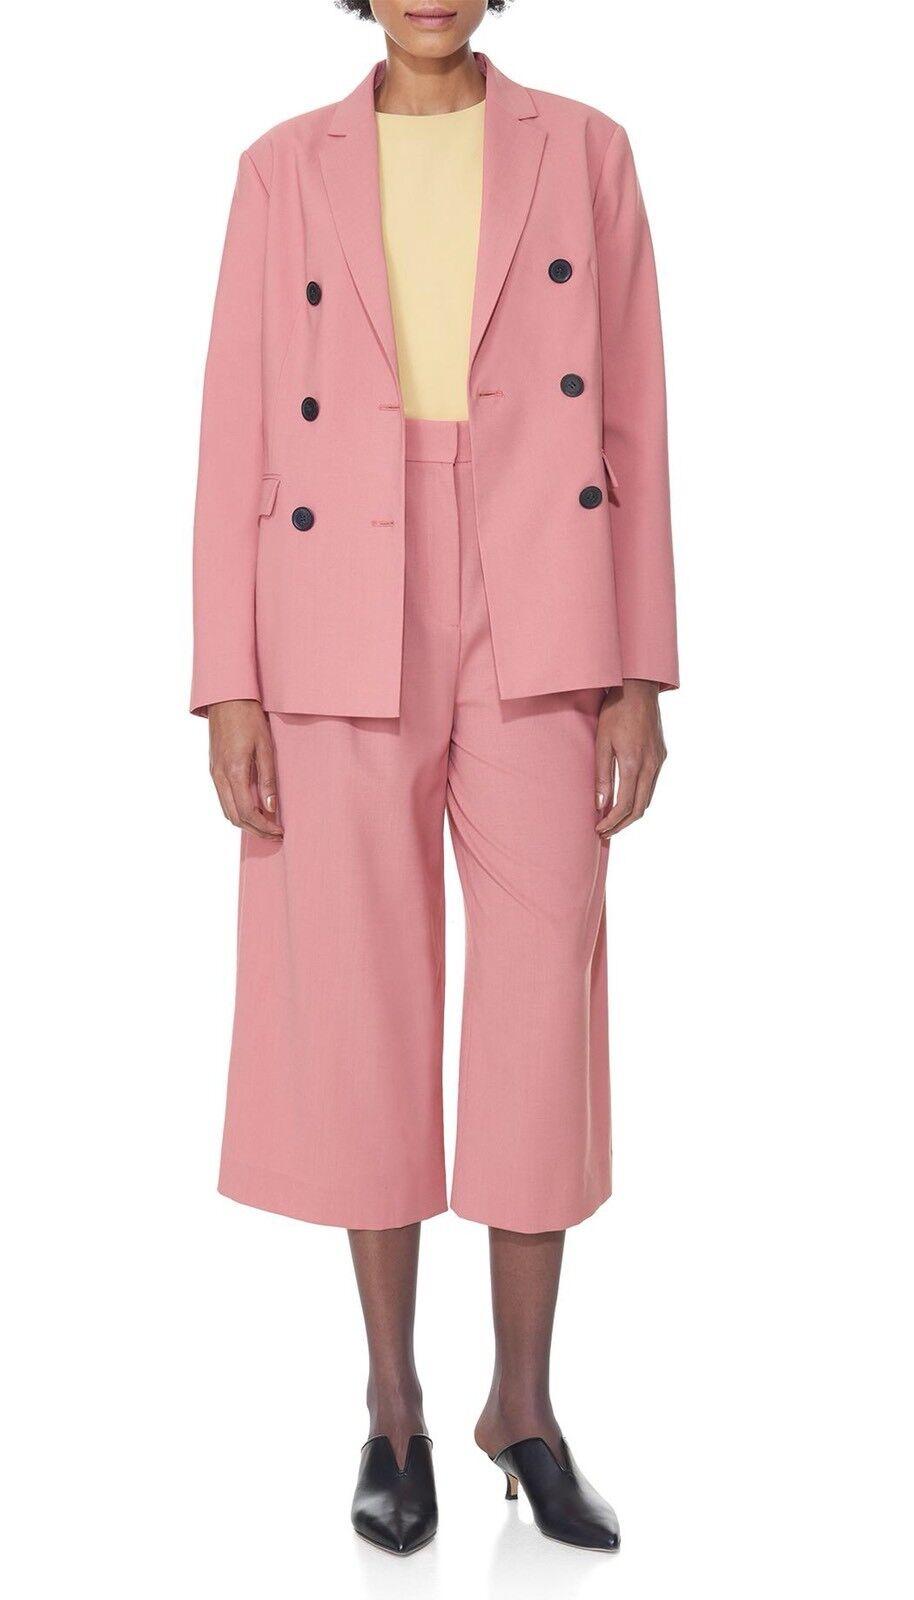 Tibi Tropical Wool Blazer Size 2